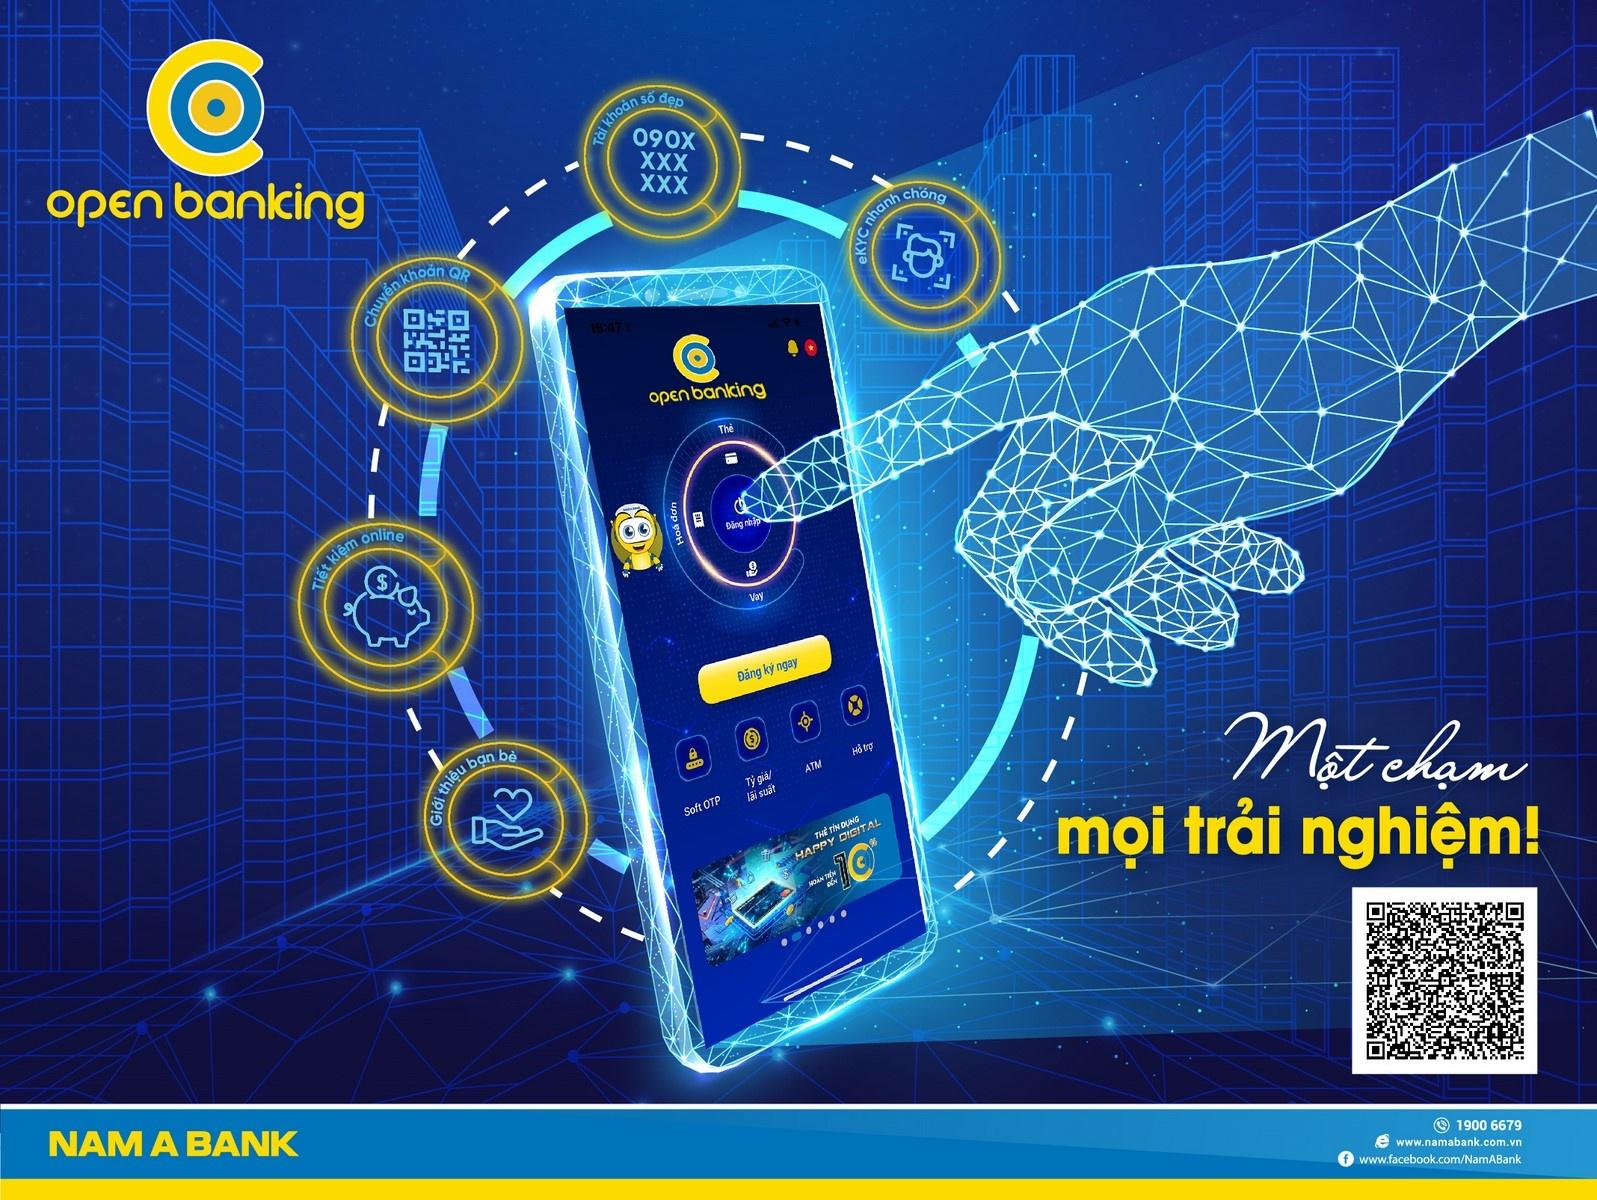 open banking phien ban 20 voi nhieu tinh nang uu viet